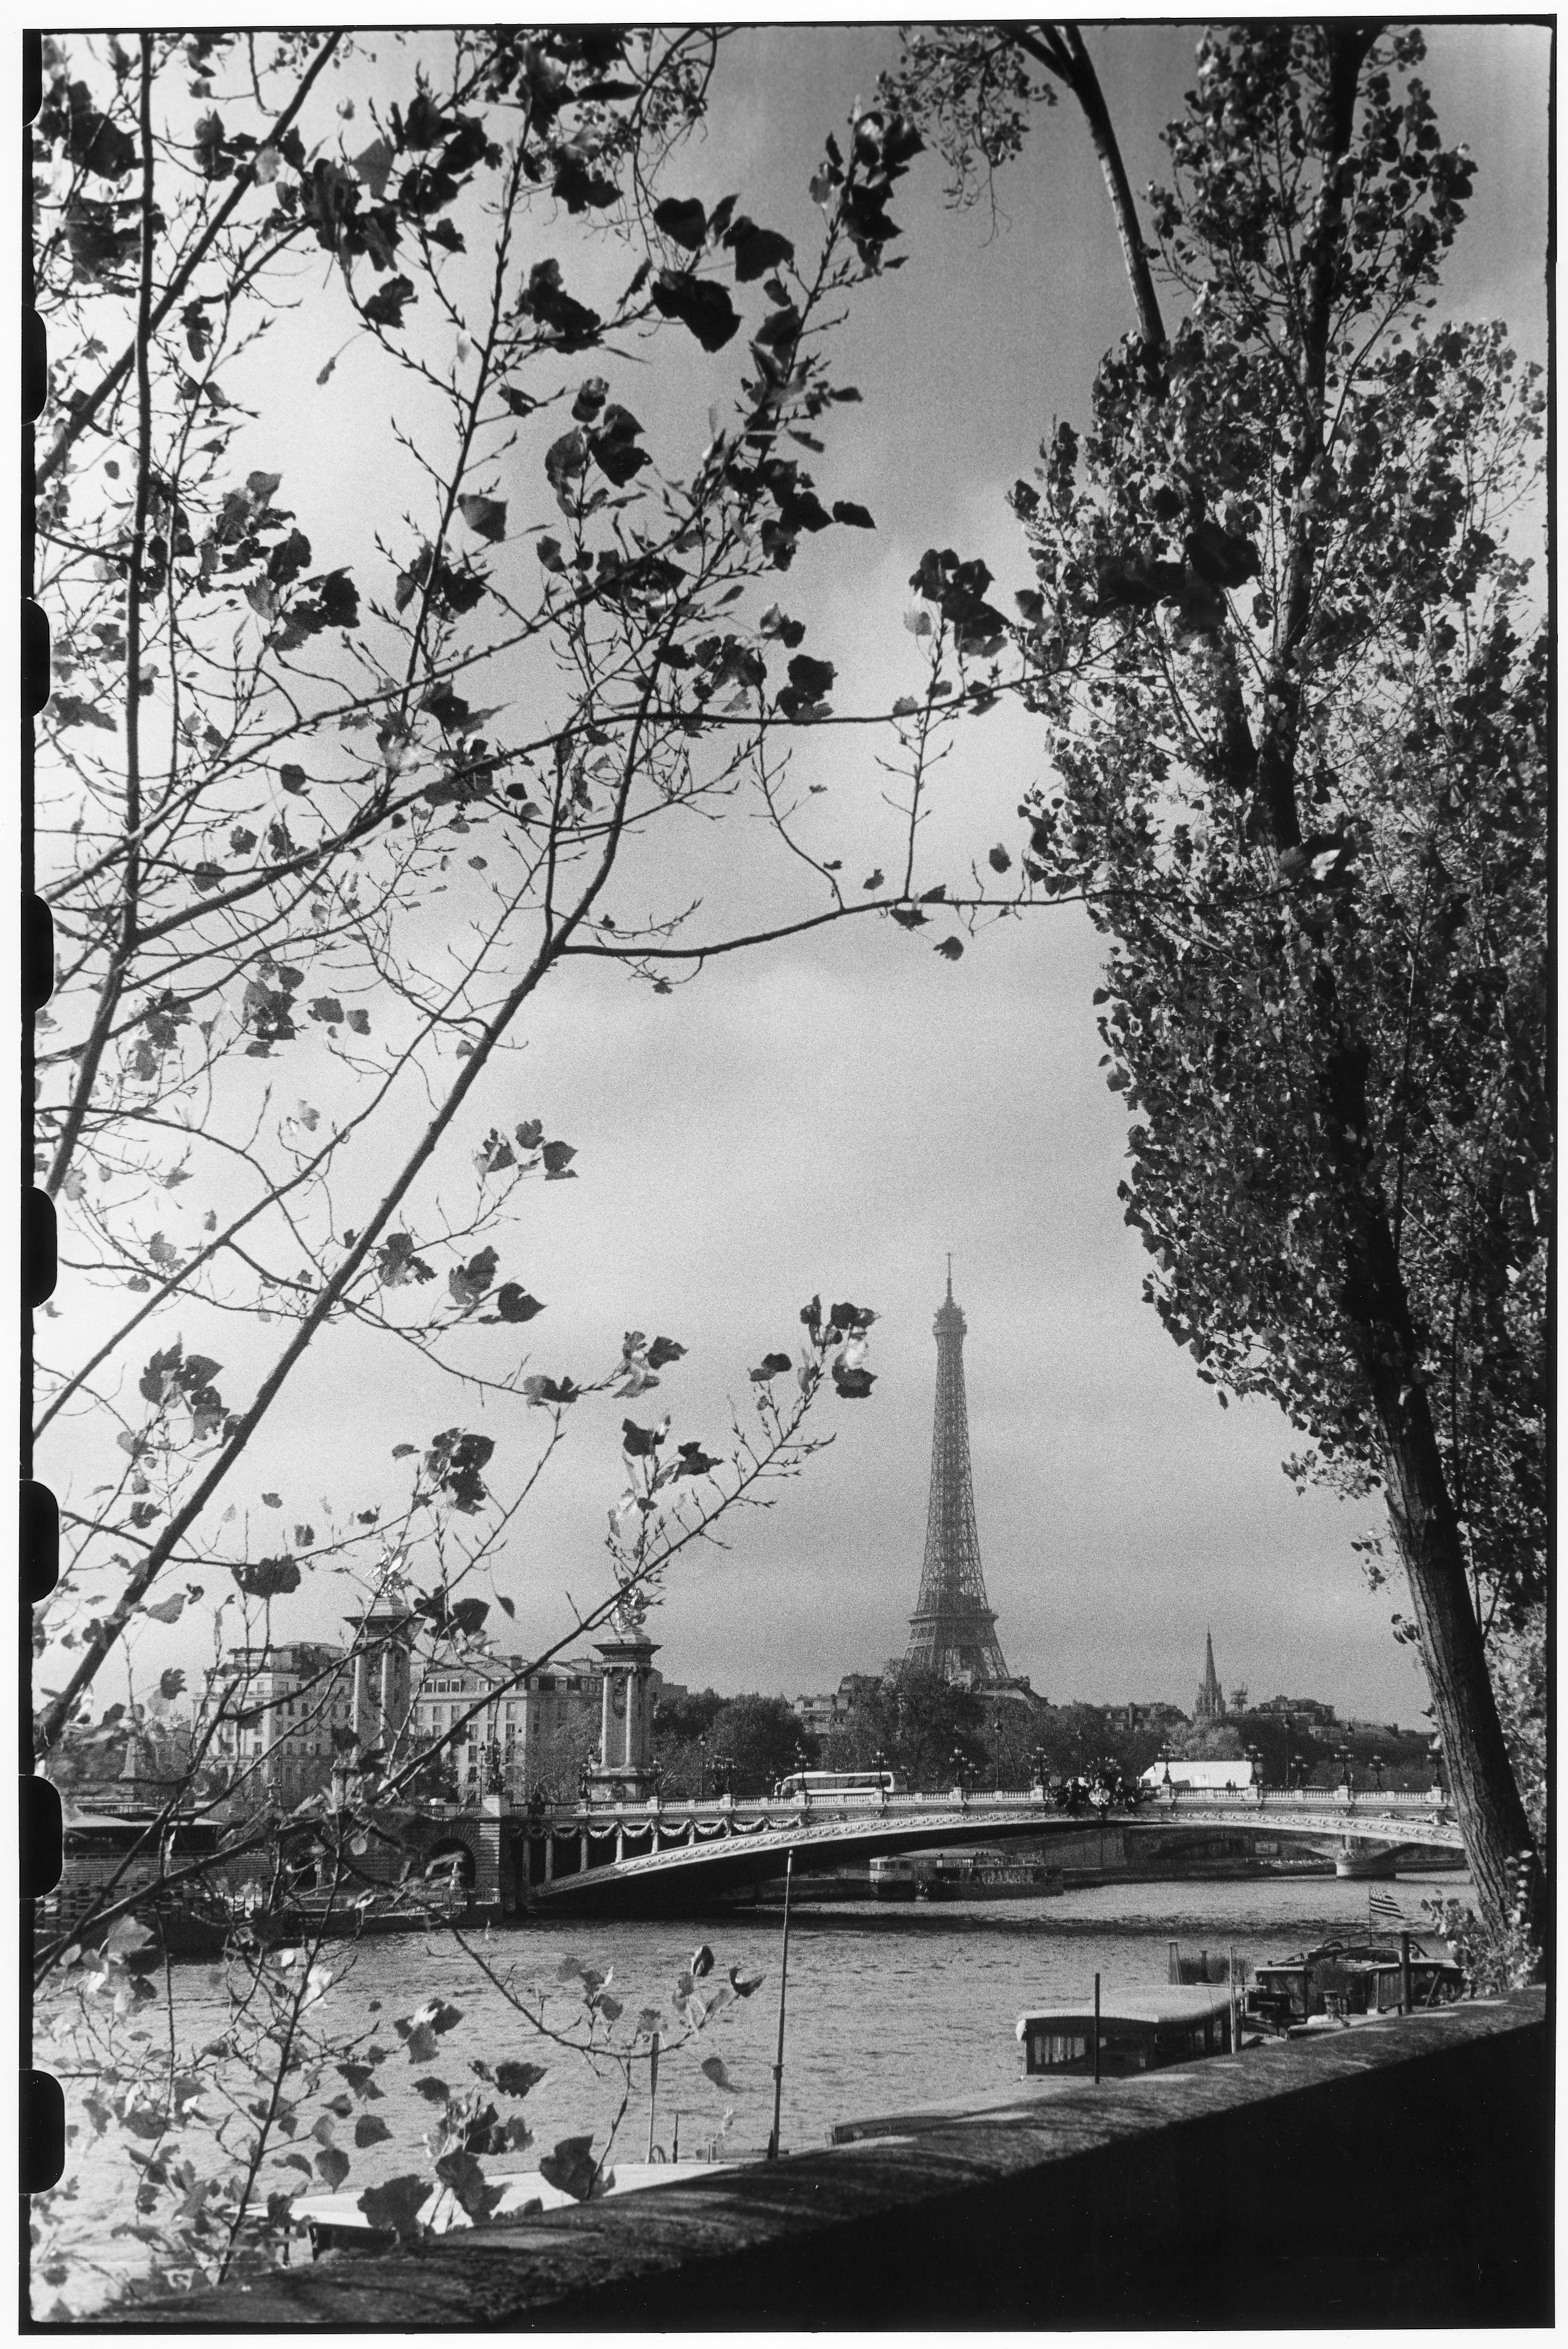 La tour Eiffel en novembre